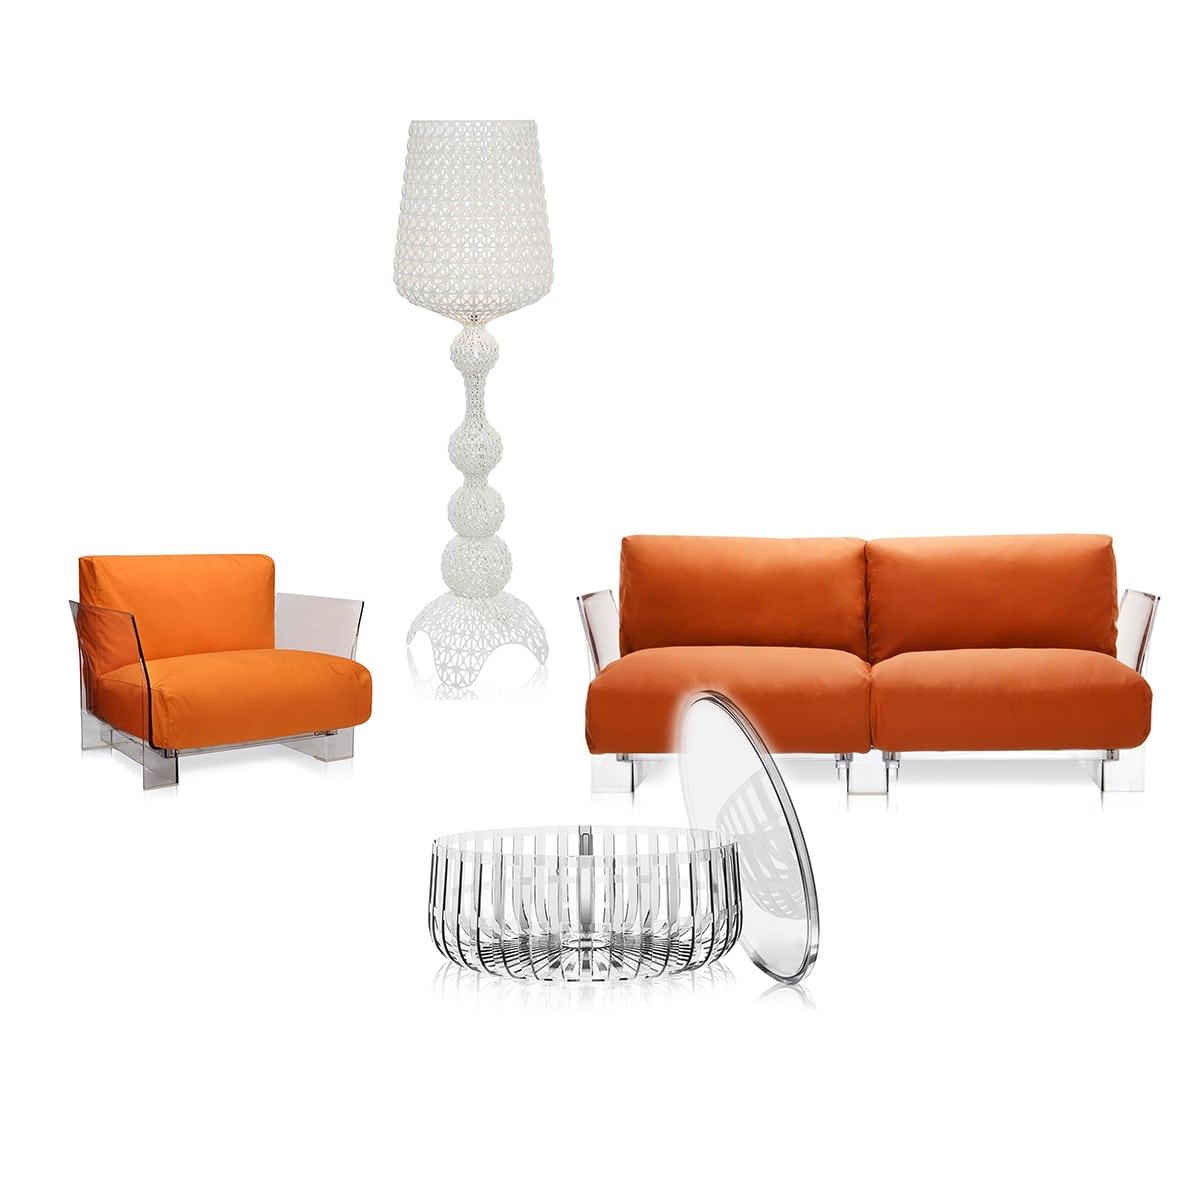 Set canapea, fotoliu, masa si lampa pentru exterior | KARTELL